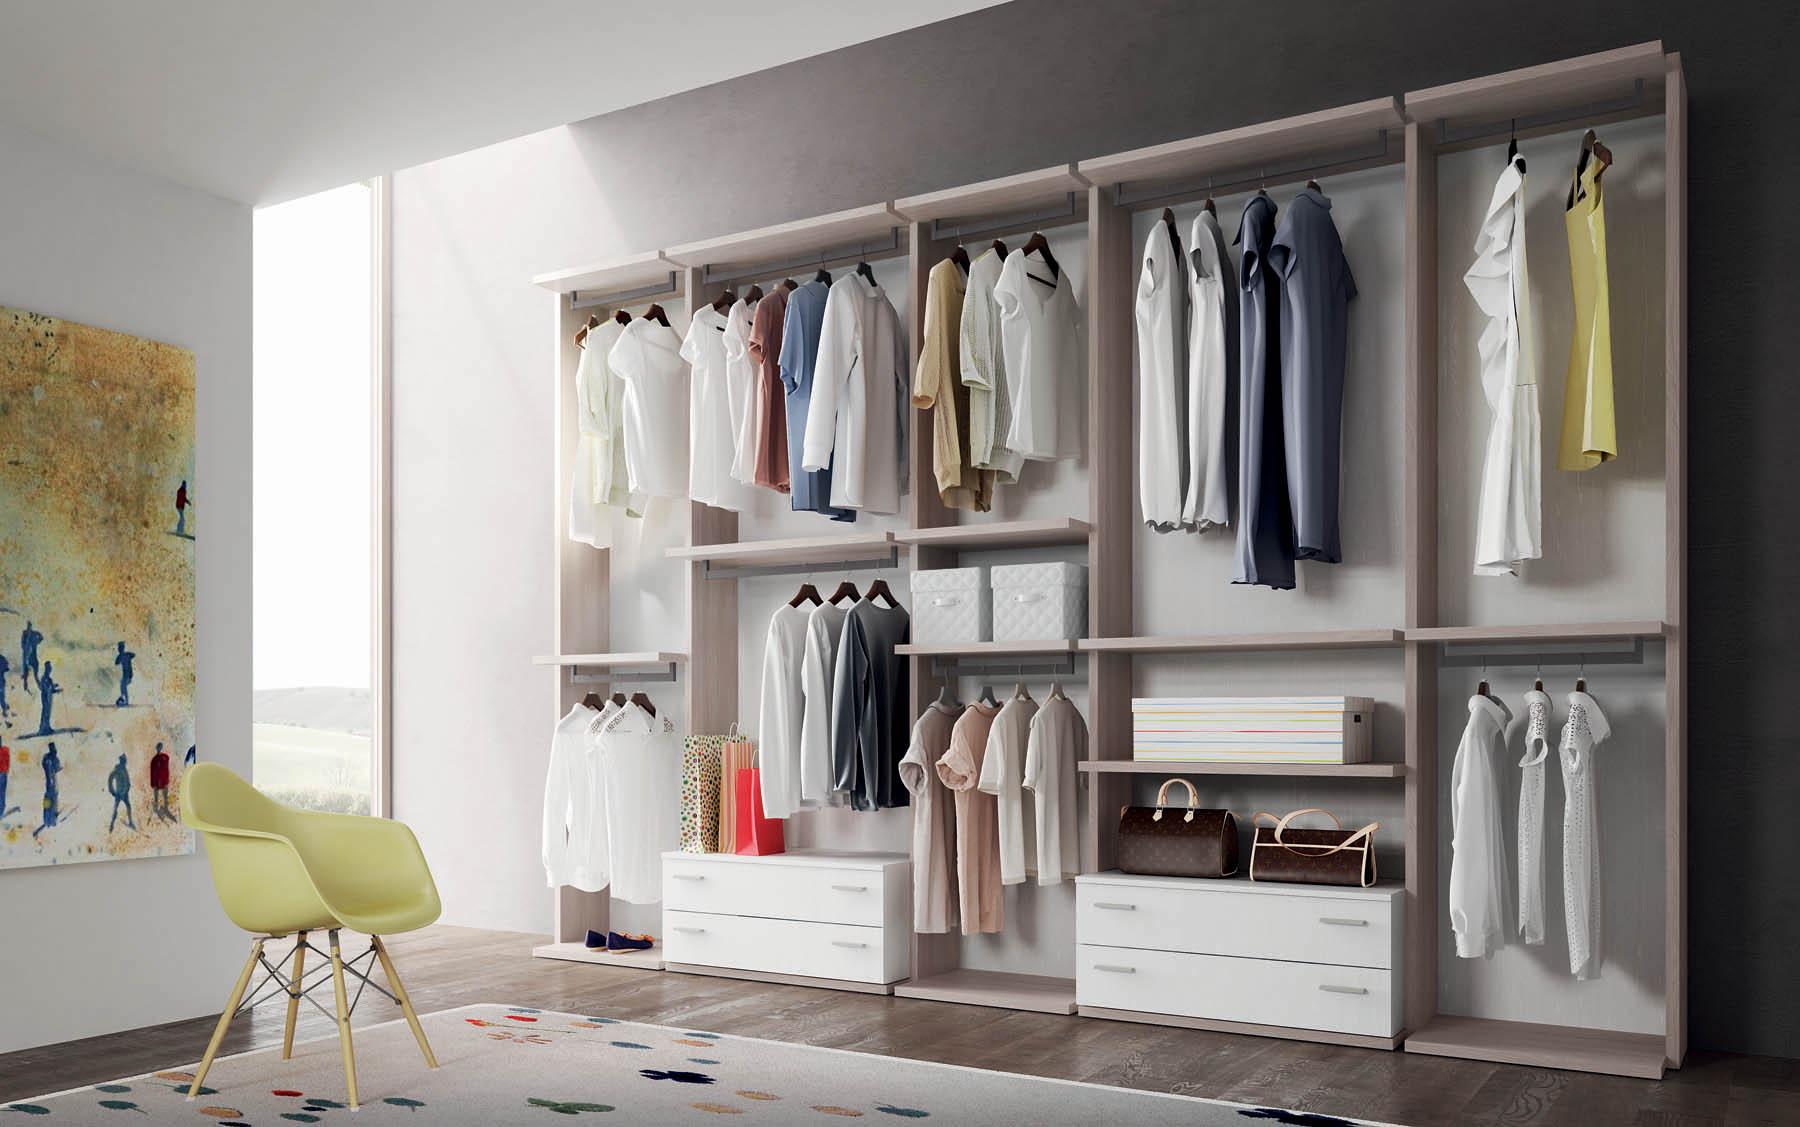 Cabina armadio armadi e cabine mistral for Ikea armadi scorrevoli